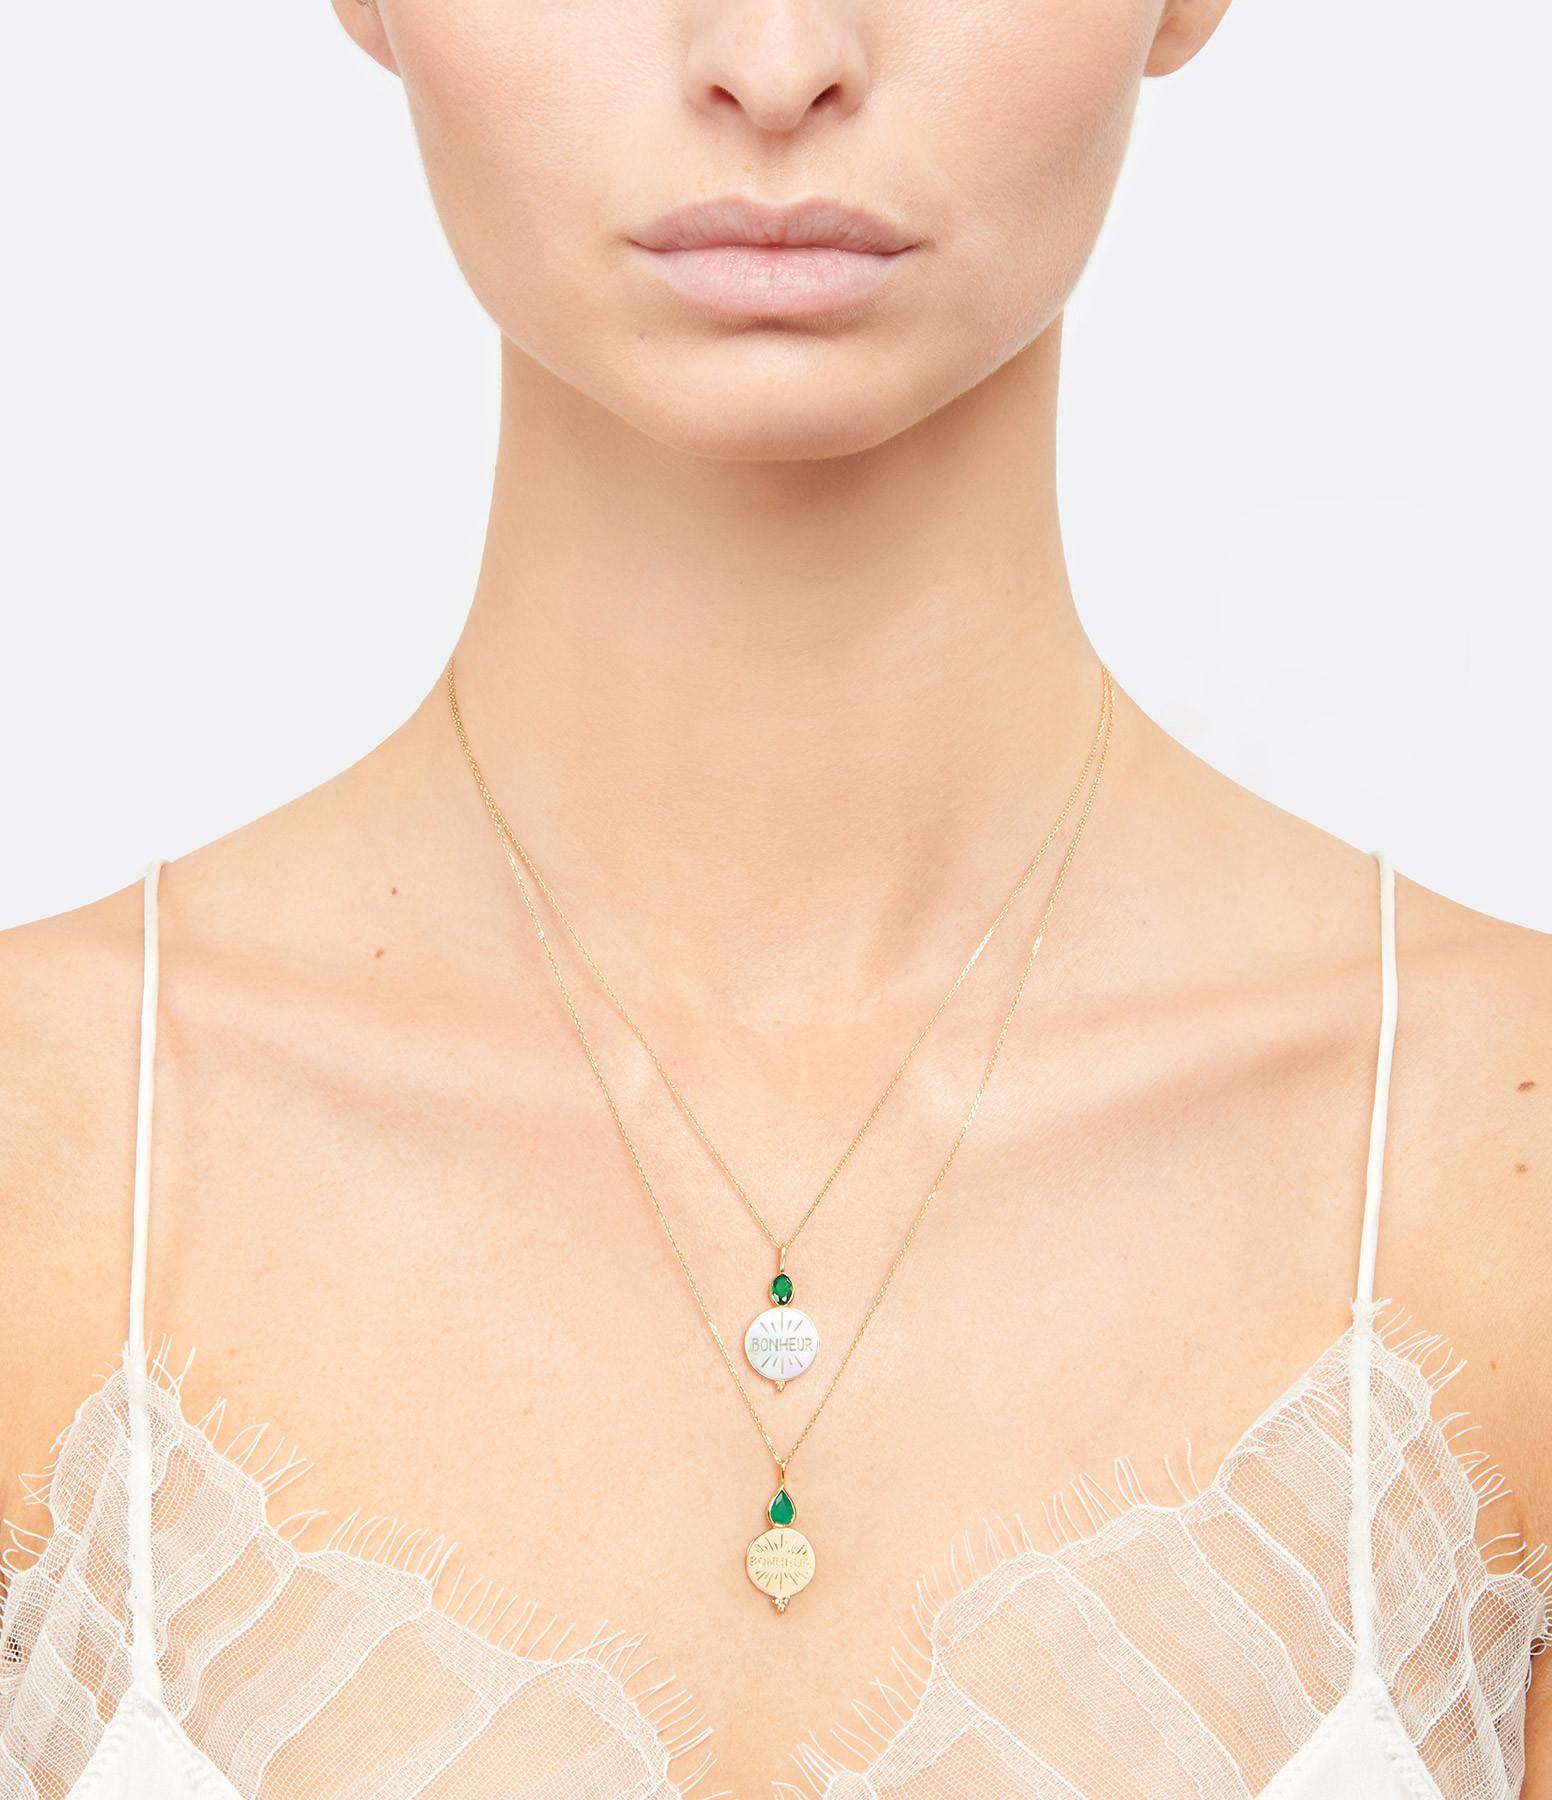 LA SUPERBE - Pendentif Bonheur Or Jaune, Nacre et  Agate Verte